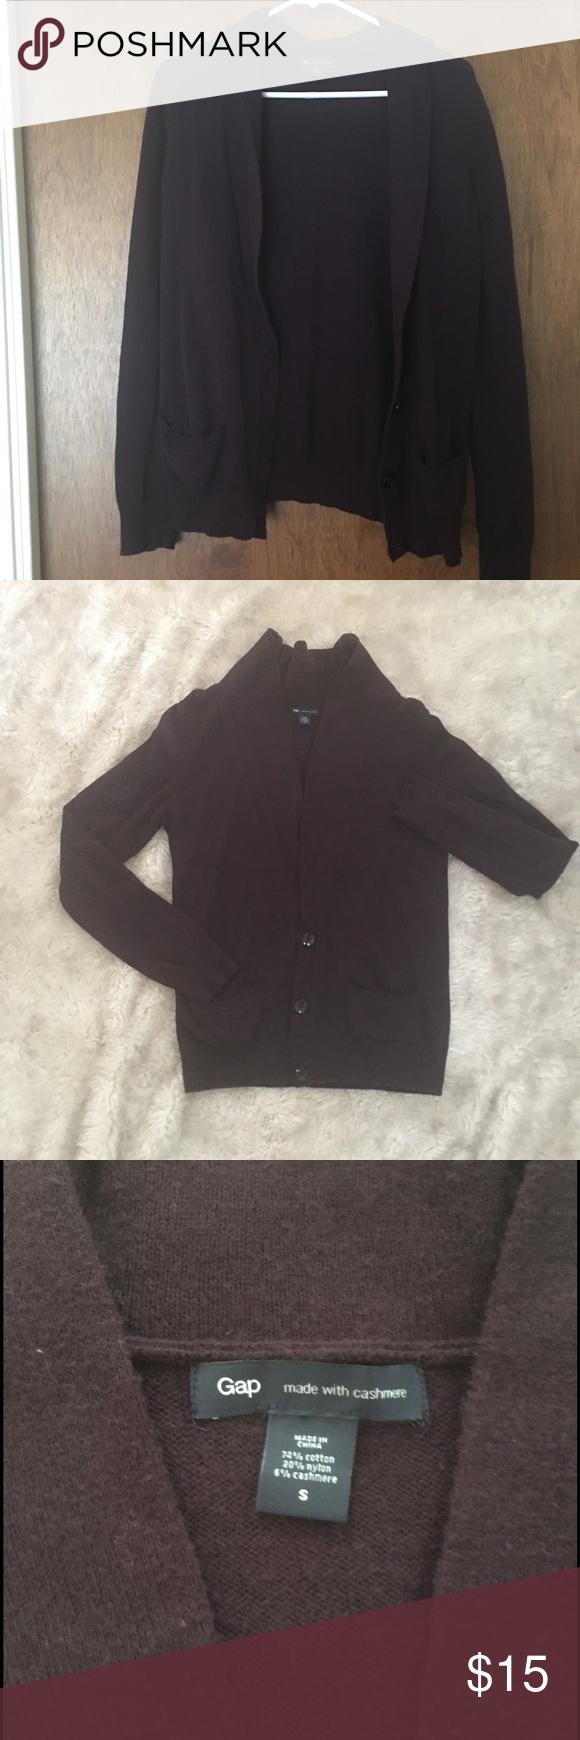 GAP Cardigan Sweater Cashmere Blend - Dark Purple | Dark purple ...